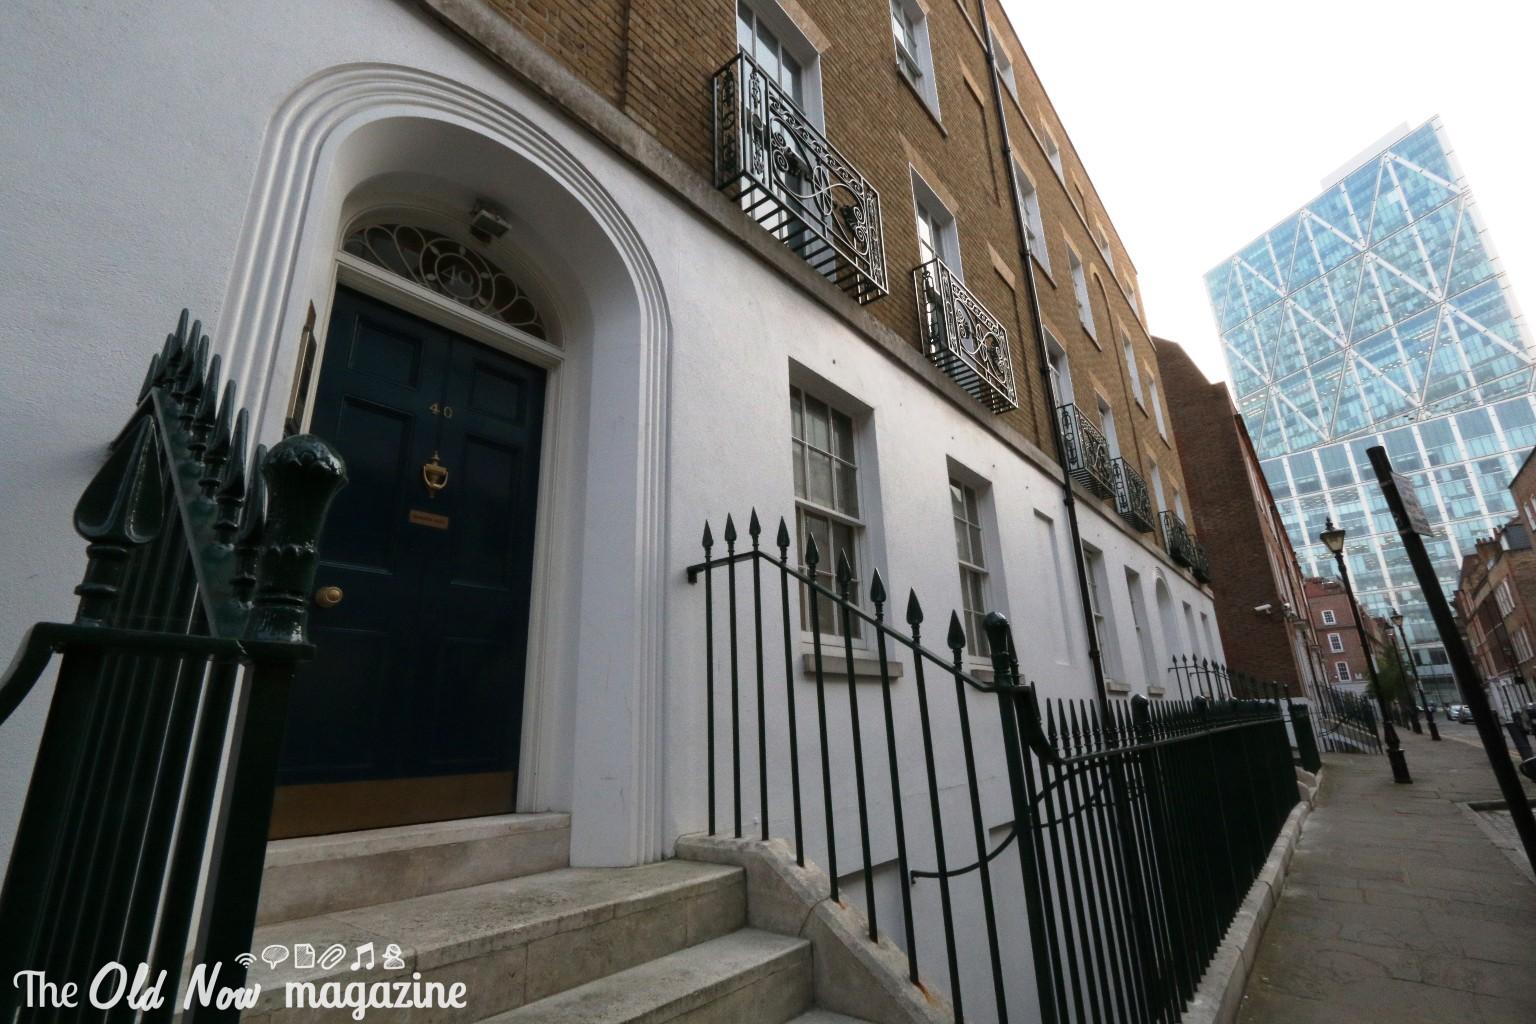 LONDRA THEOLDNOW (67)